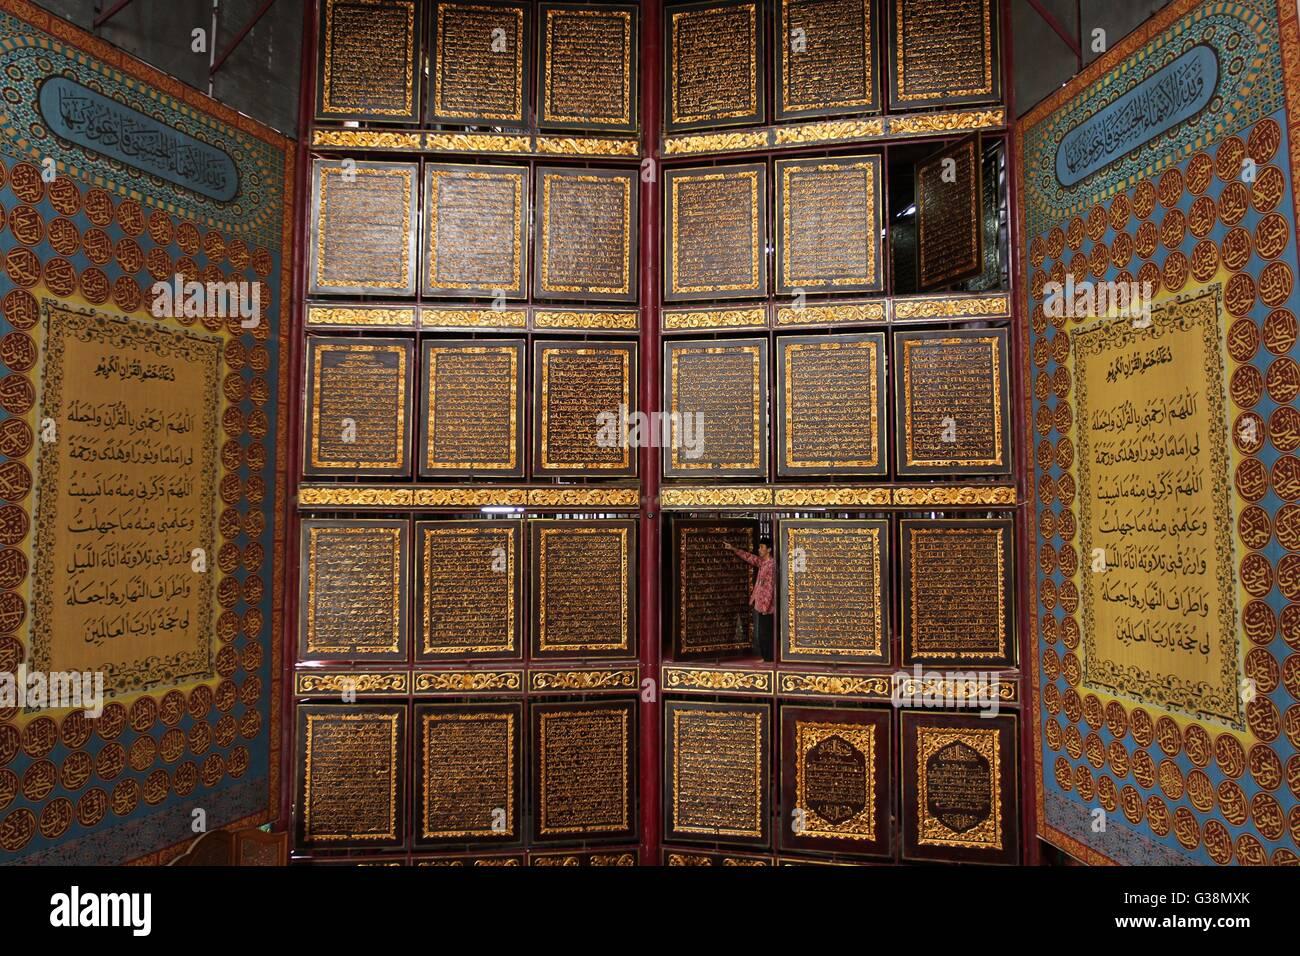 Palembang, Indonesia. 9th June, 2016. An official checks large wooden panels of the Koran in Palembang, Indonesia, - Stock Image